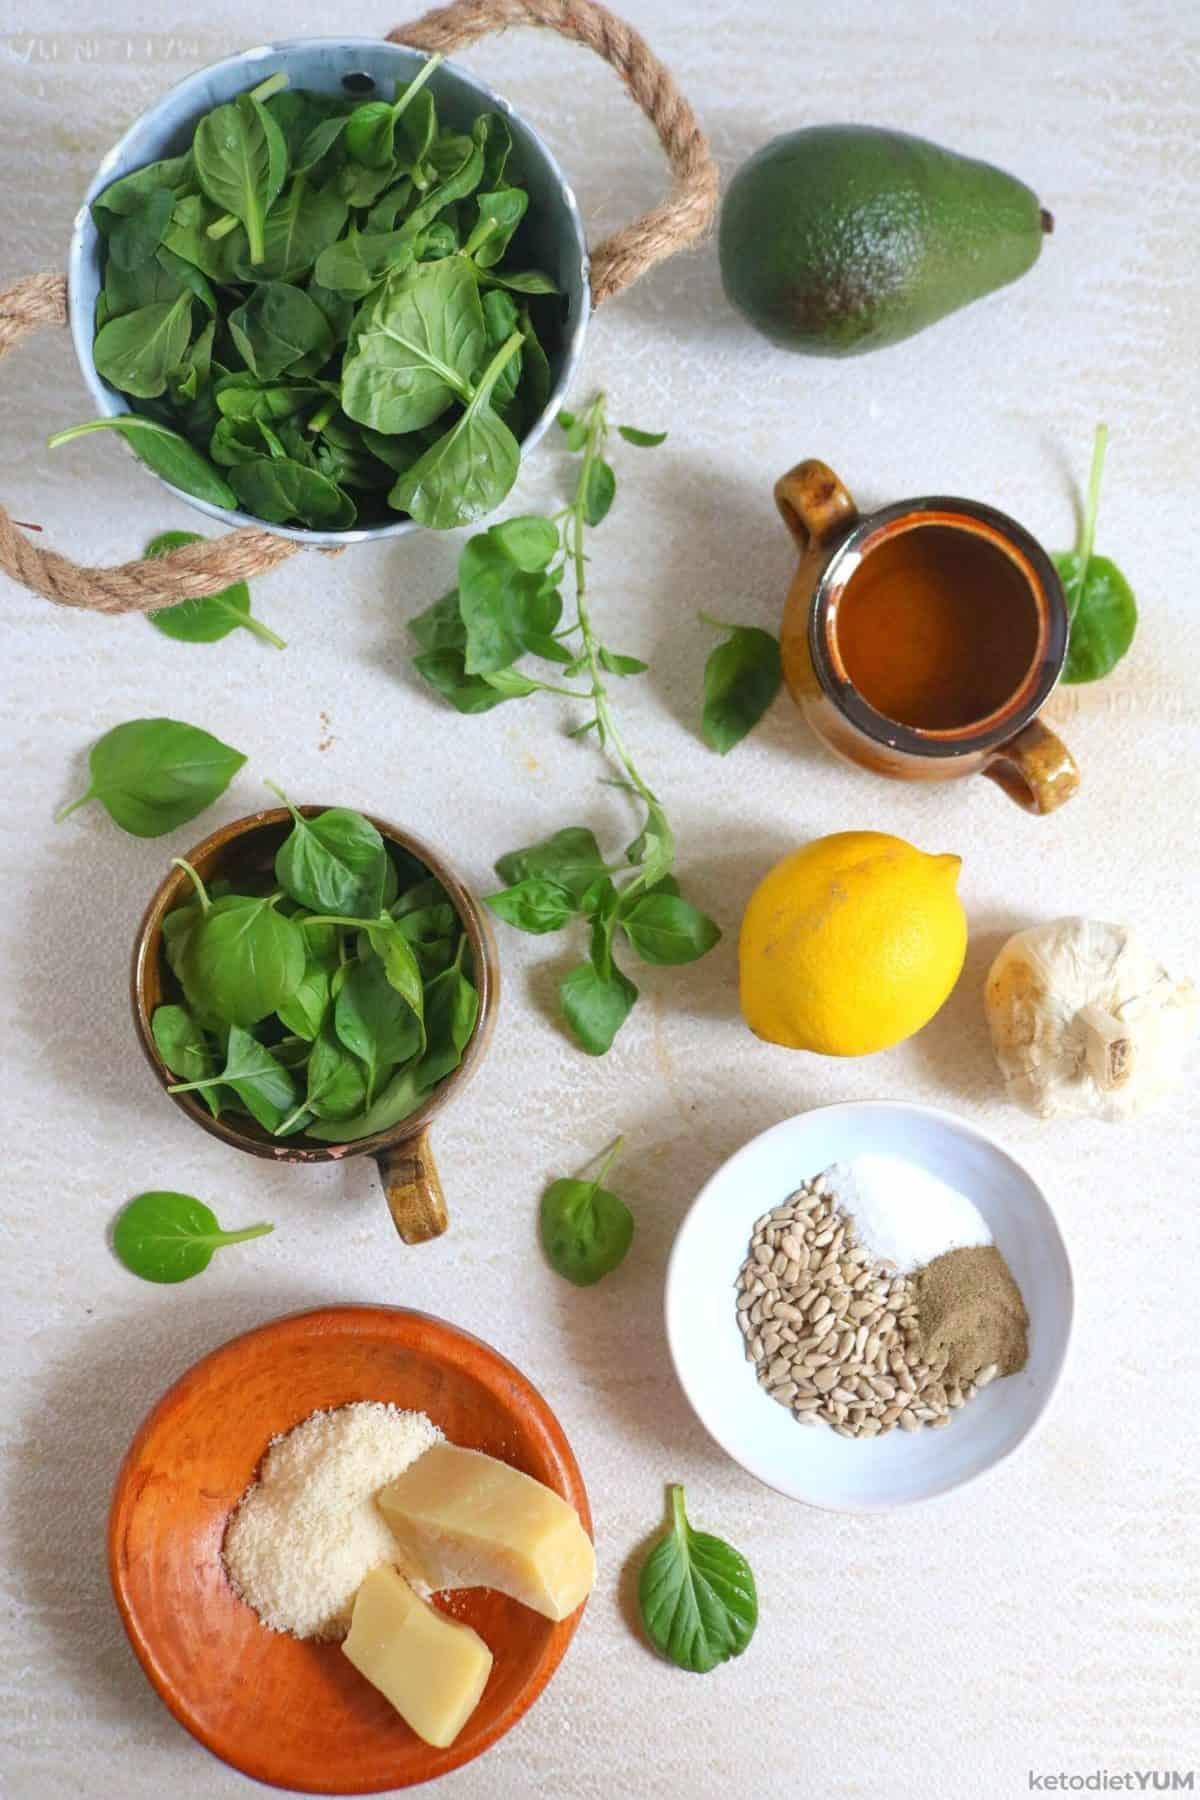 Fresh ingredients for homemade avocado pesto